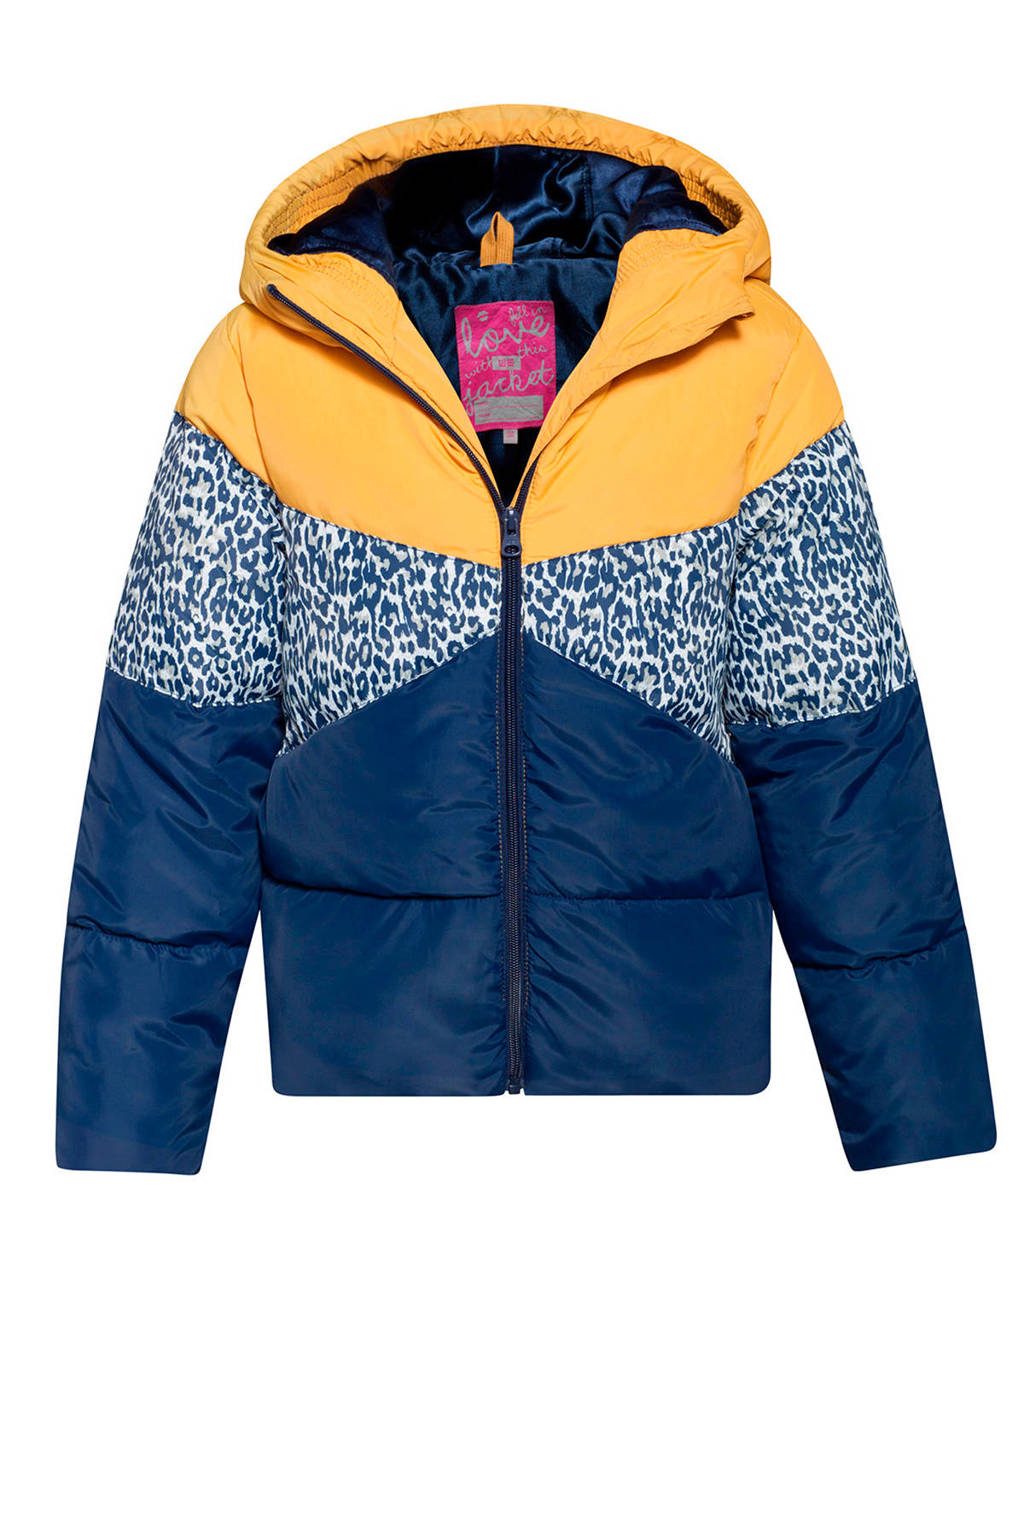 WE Fashion winterjas met capuchon donkerblauw, Donkerblauw/geel/blauw panter